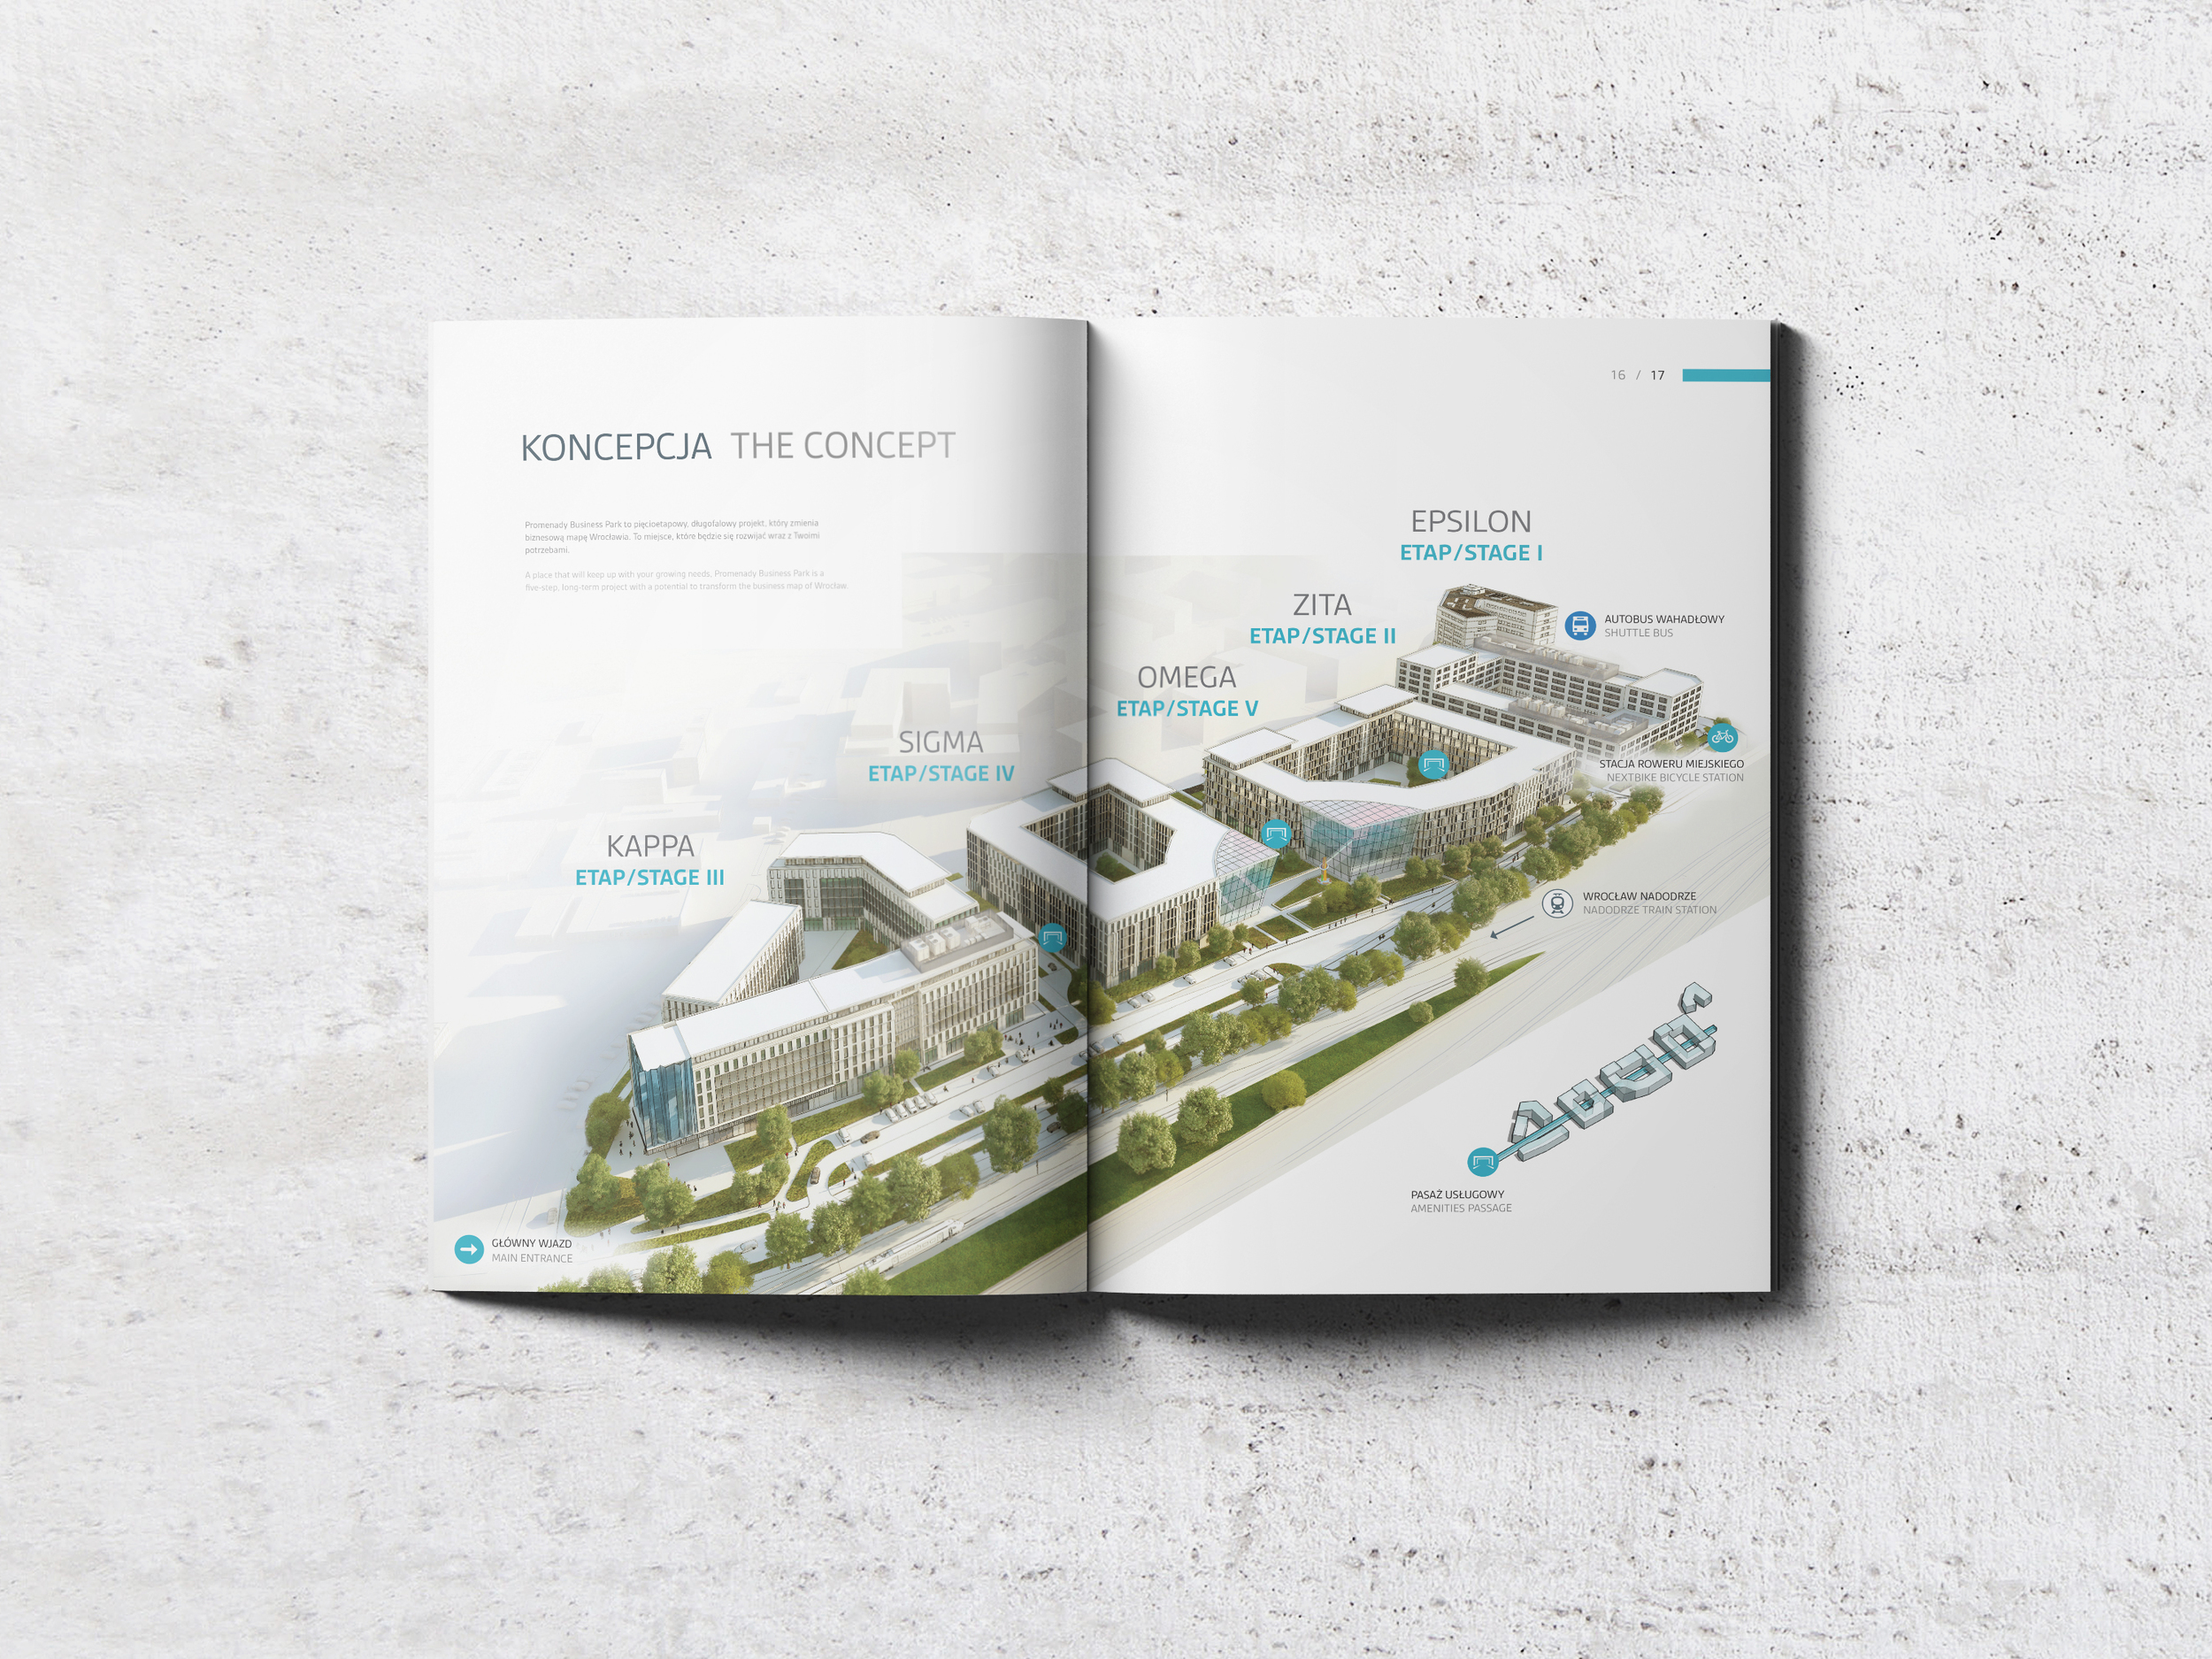 2015 Vantage Promenady brochure 6.jpg